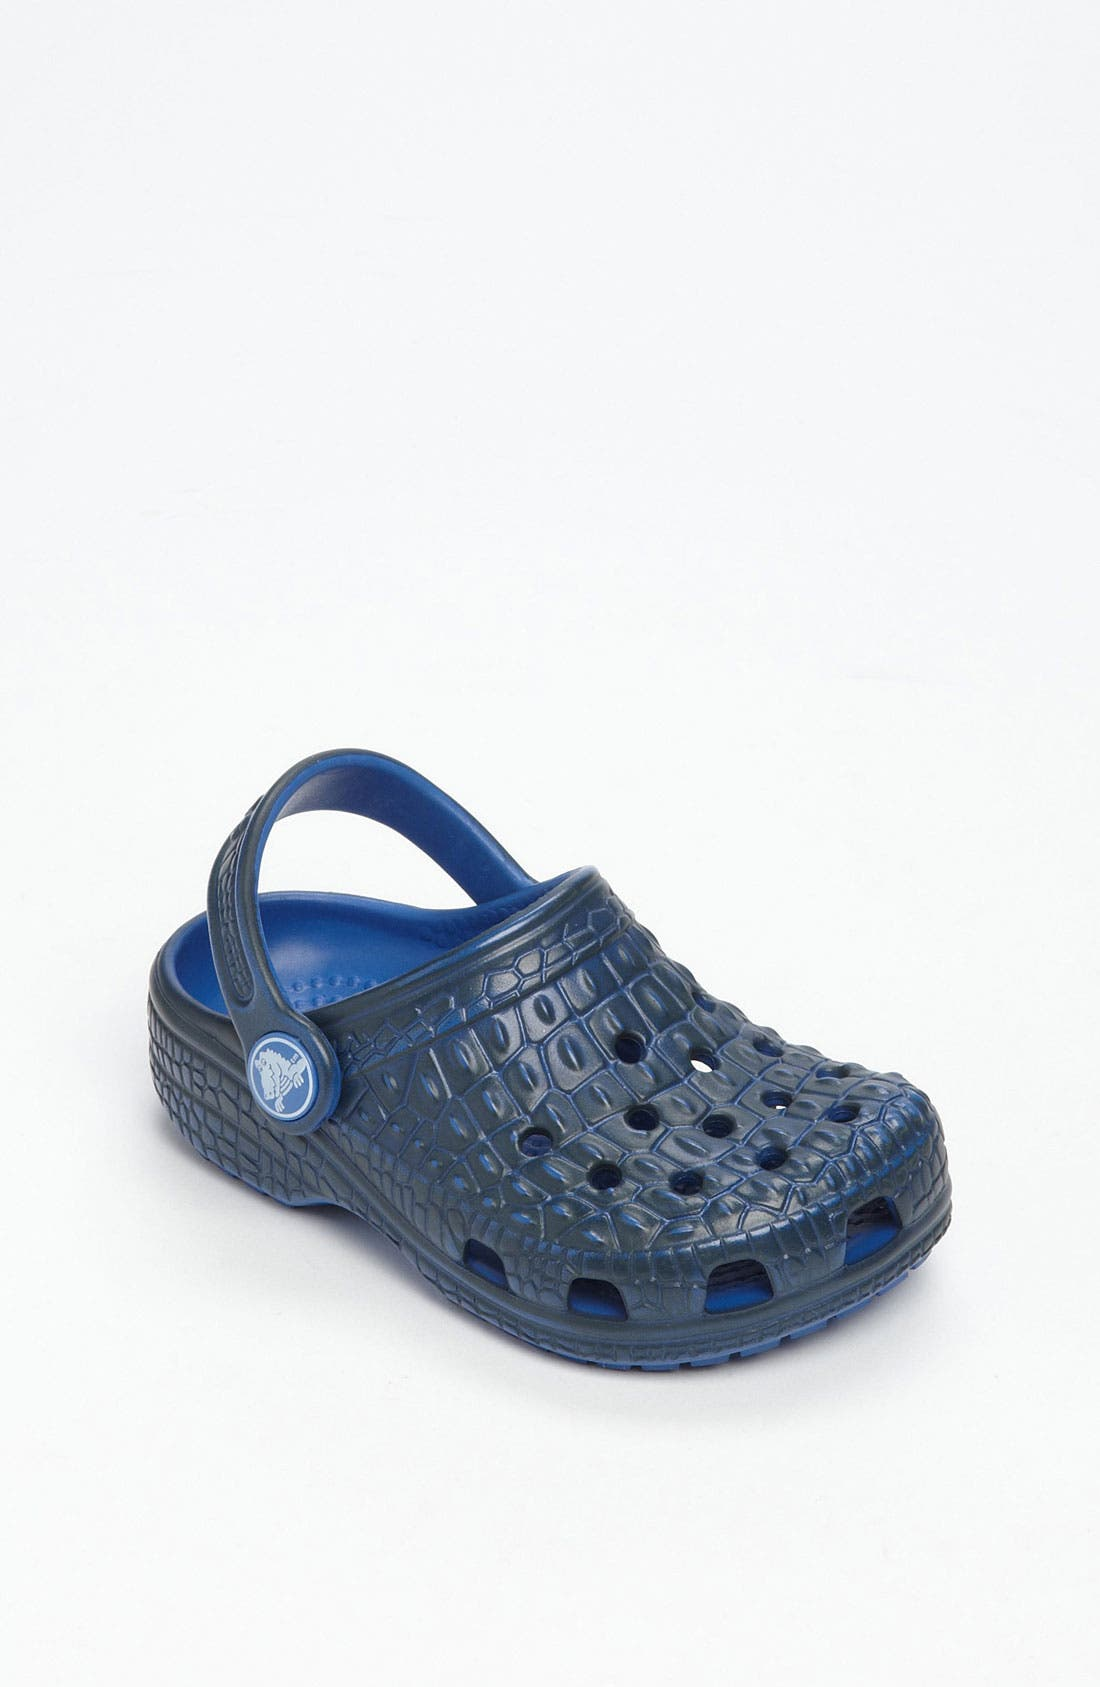 Main Image - CROCS™ 'Crocskin' Slip-On (Walker, Toddler & Little Kid)